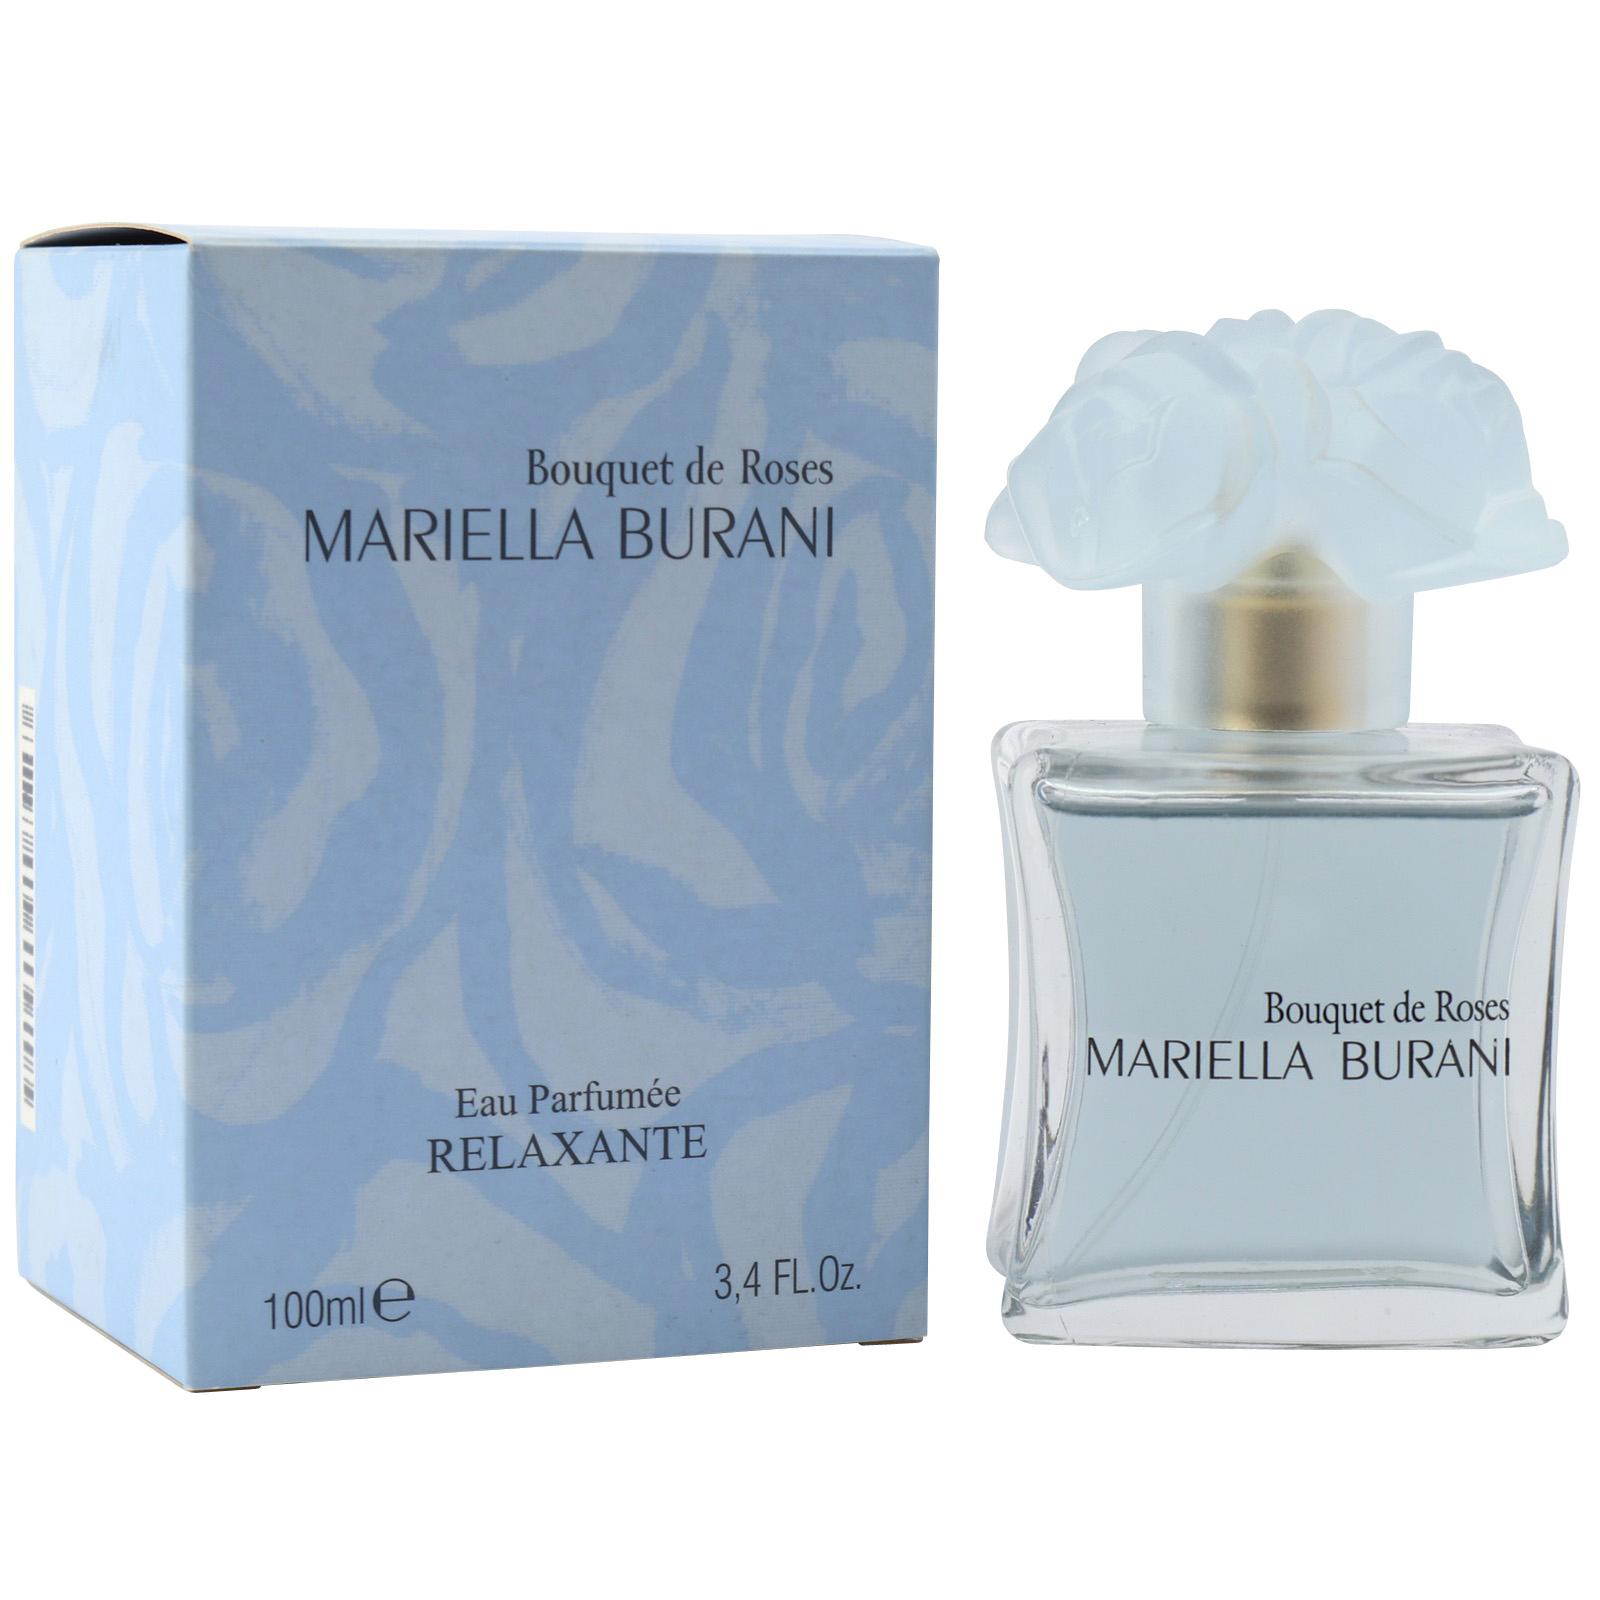 Mariella Burani Bouquet De Roses Relaxante Eau Parfumee Spray 100 Ml |  Duftwelt Hamburg pour Image Relaxante